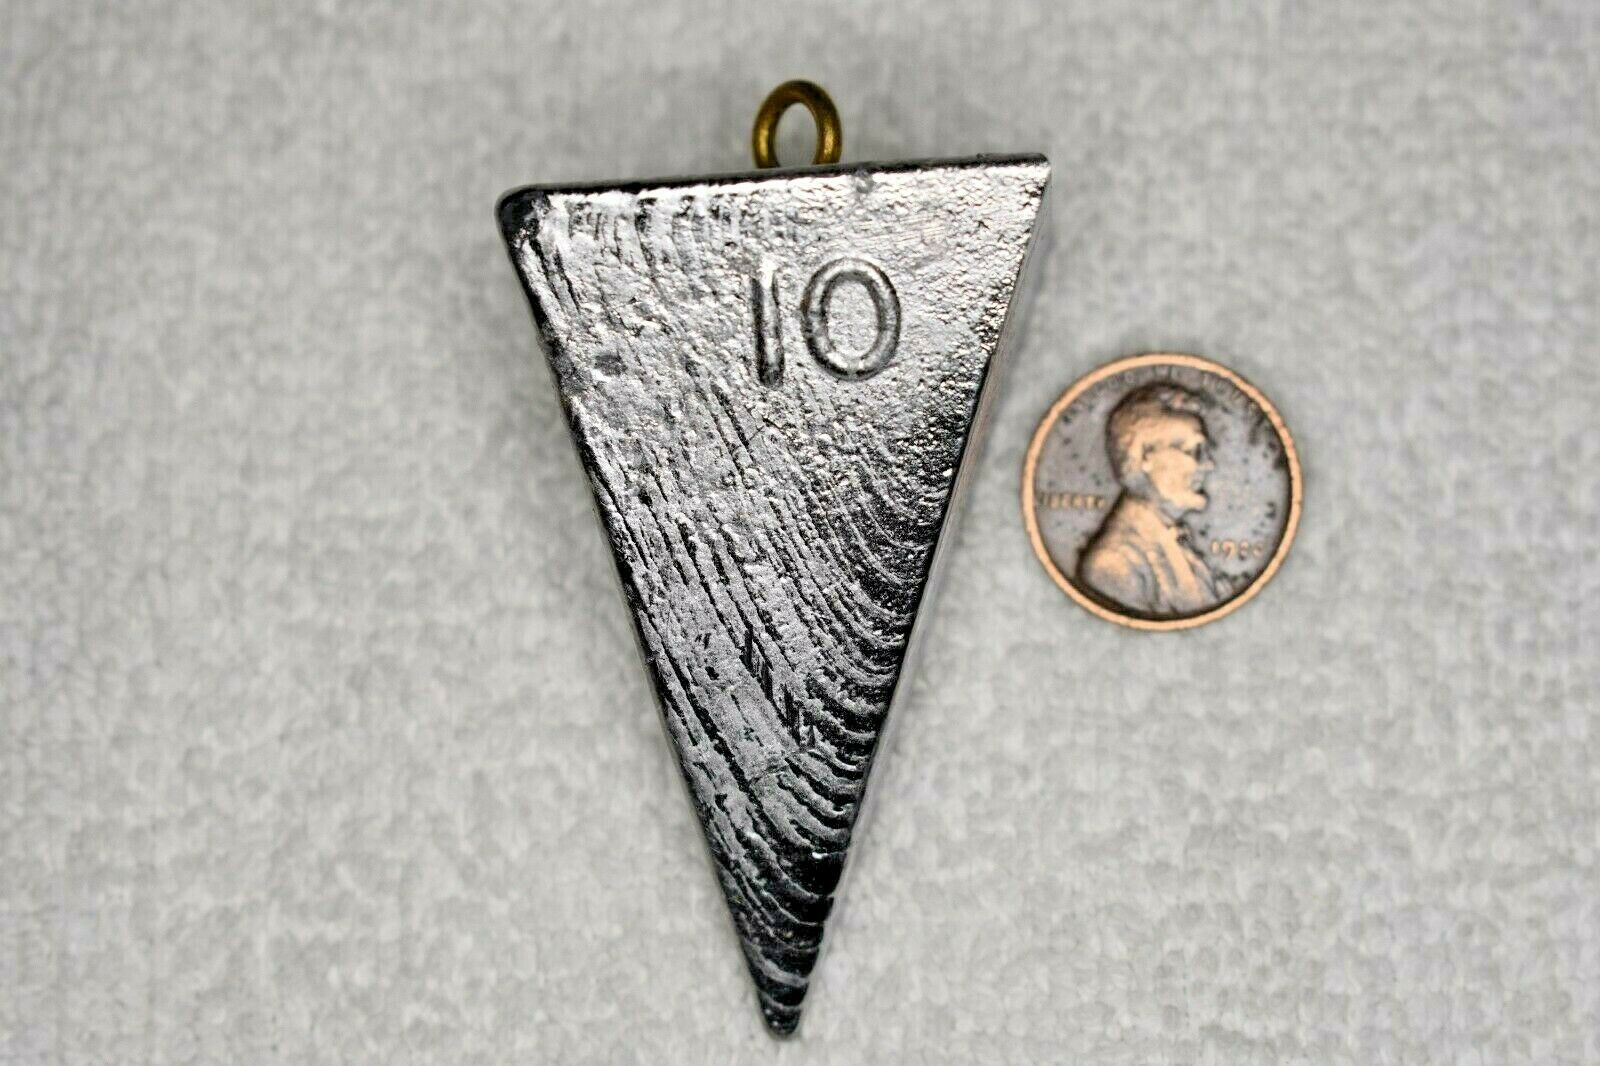 10 oz Pyramid Surf Fishing Blei Gewichte Sinkers - 50 Pfund - Free Shipping